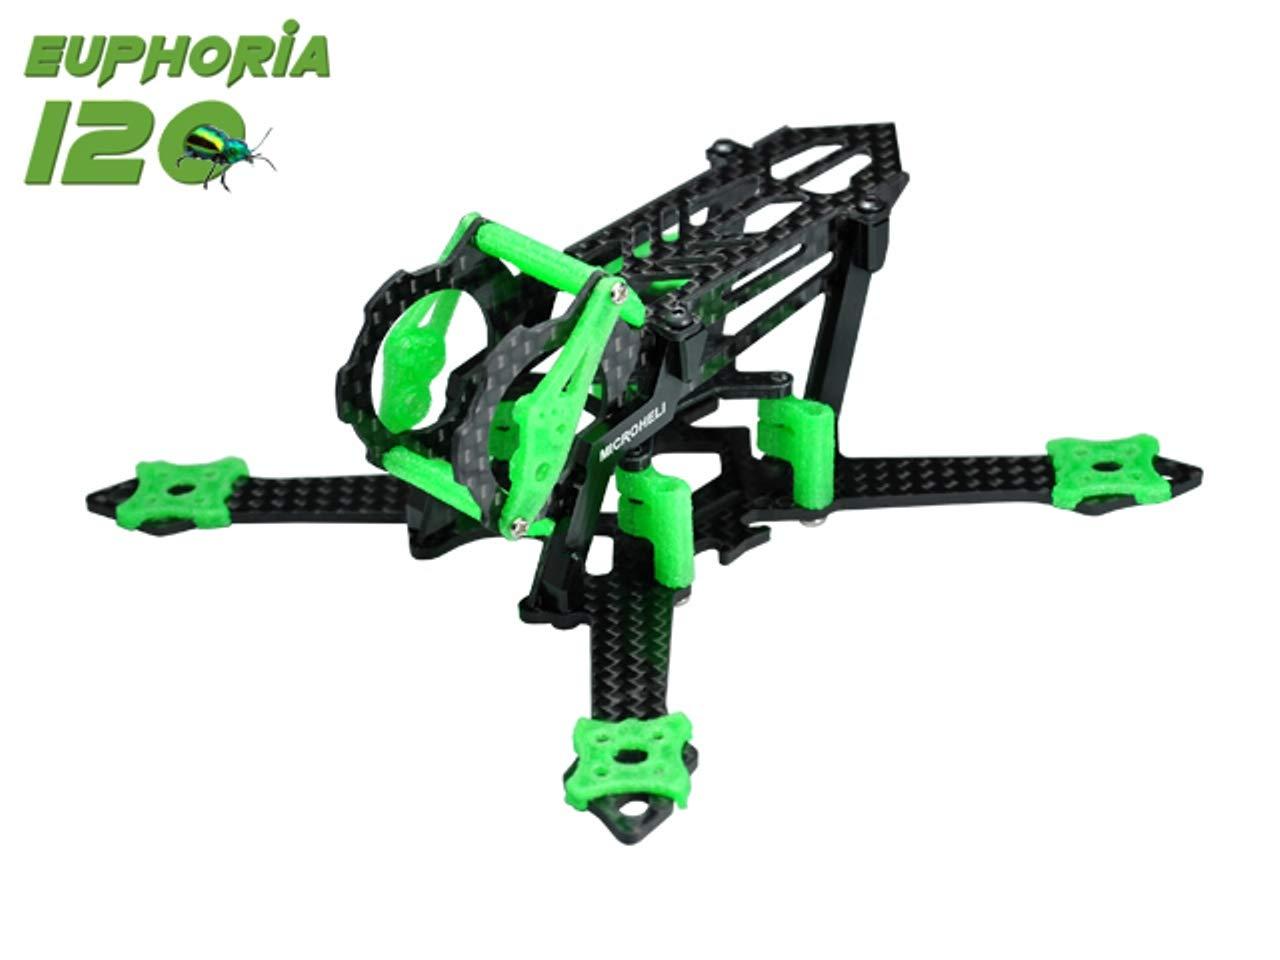 Euphoria 120 レーシングフレームキット (グリーン)   B07GDJX2JF